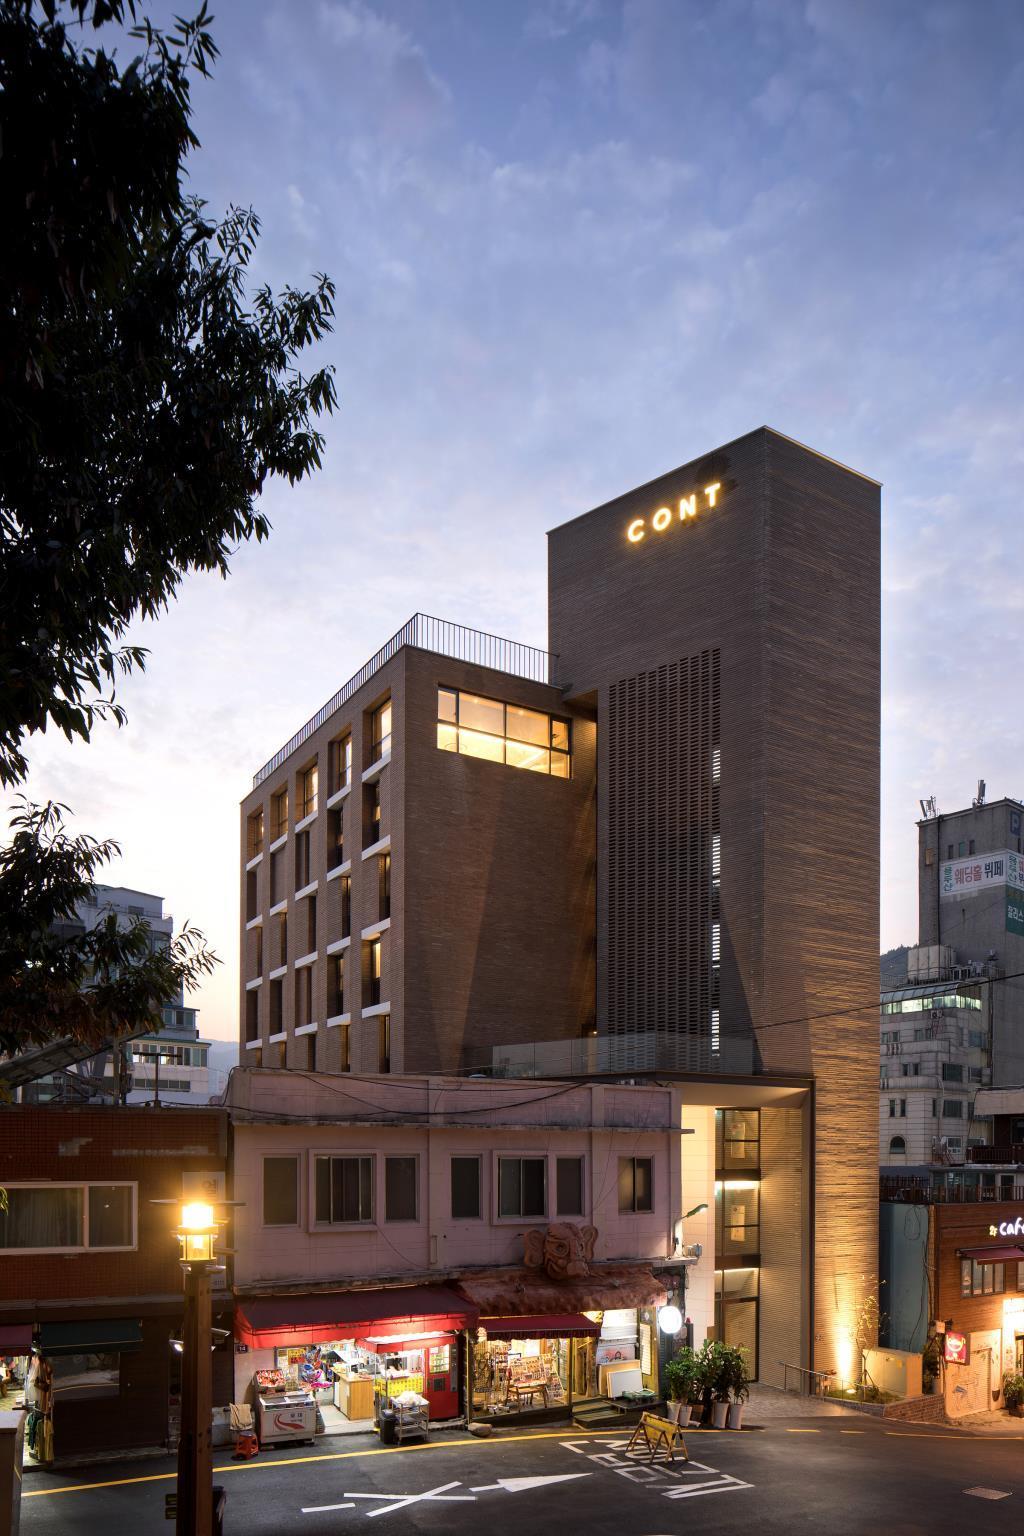 Busan Cont Hotel